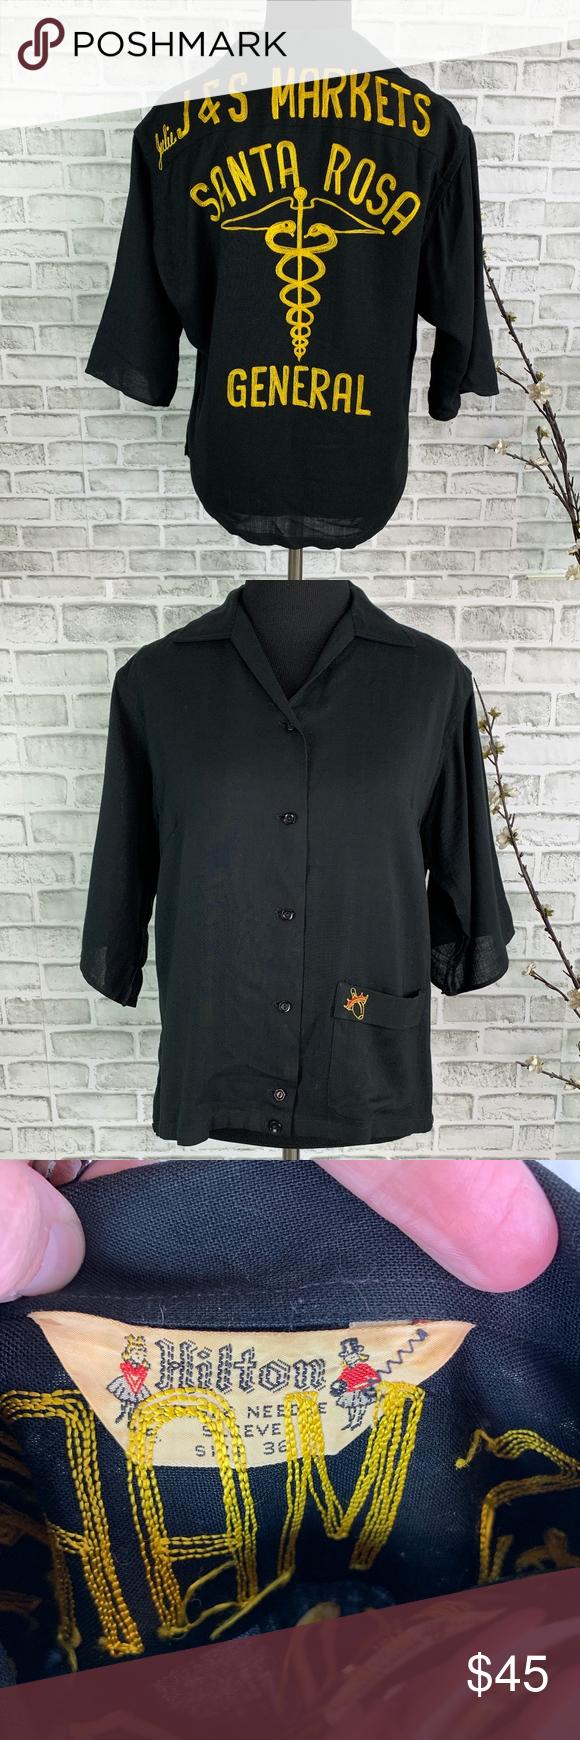 Vintage 1950s Hilton Bowling Shirt EUC Santa Rosa Brand